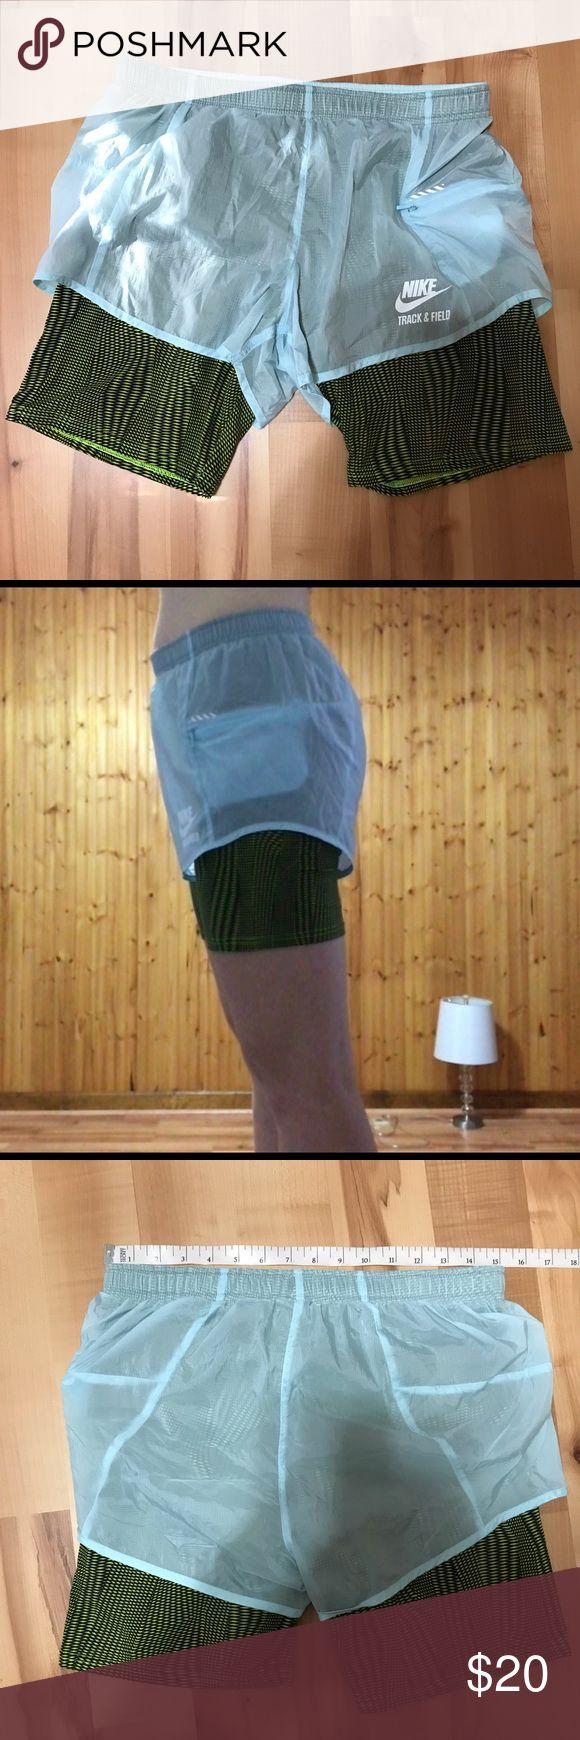 "Nike Track and Field 2-on-1 running shorts Size Medium Waist 15"" Length 14.8…"